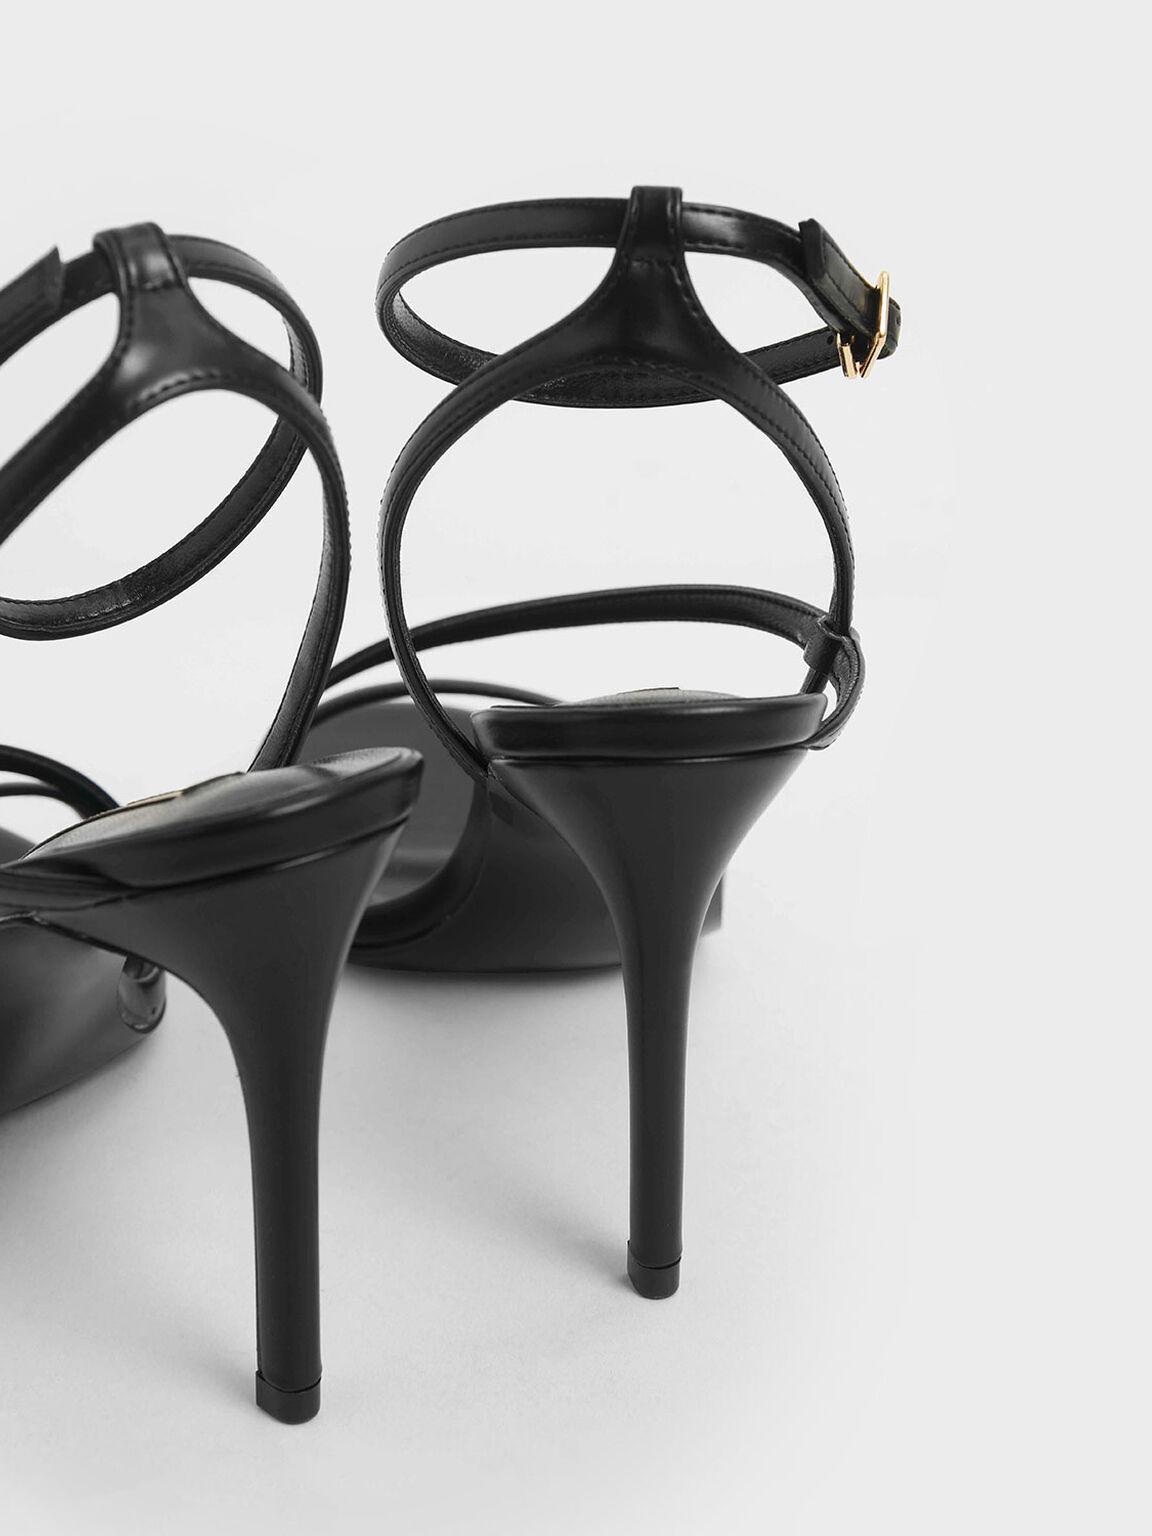 Strappy Stiletto Heel Sandals, Black, hi-res